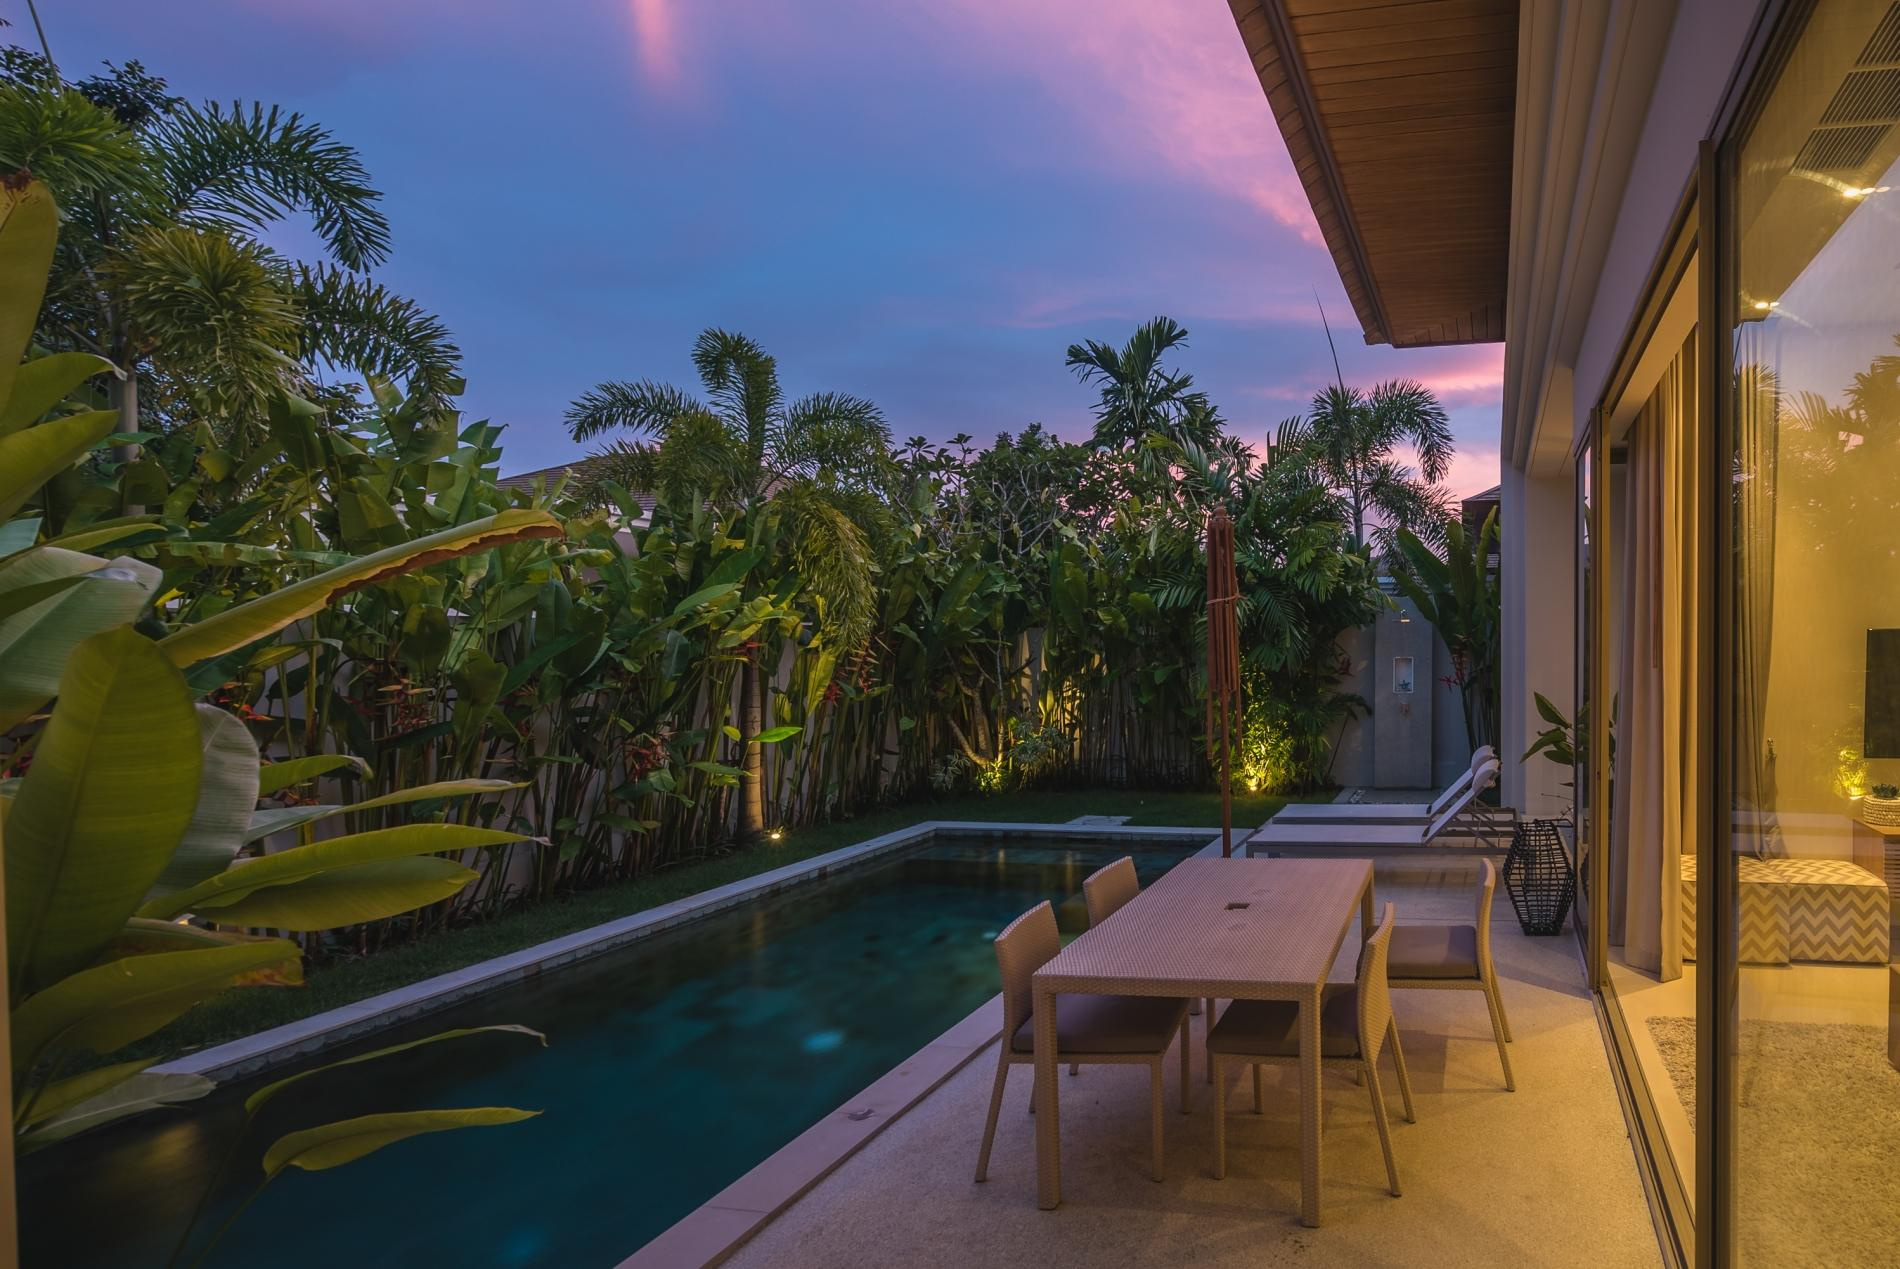 Apartment Trichada 18 - Private pool modern 3 bedroom villa photo 18771833